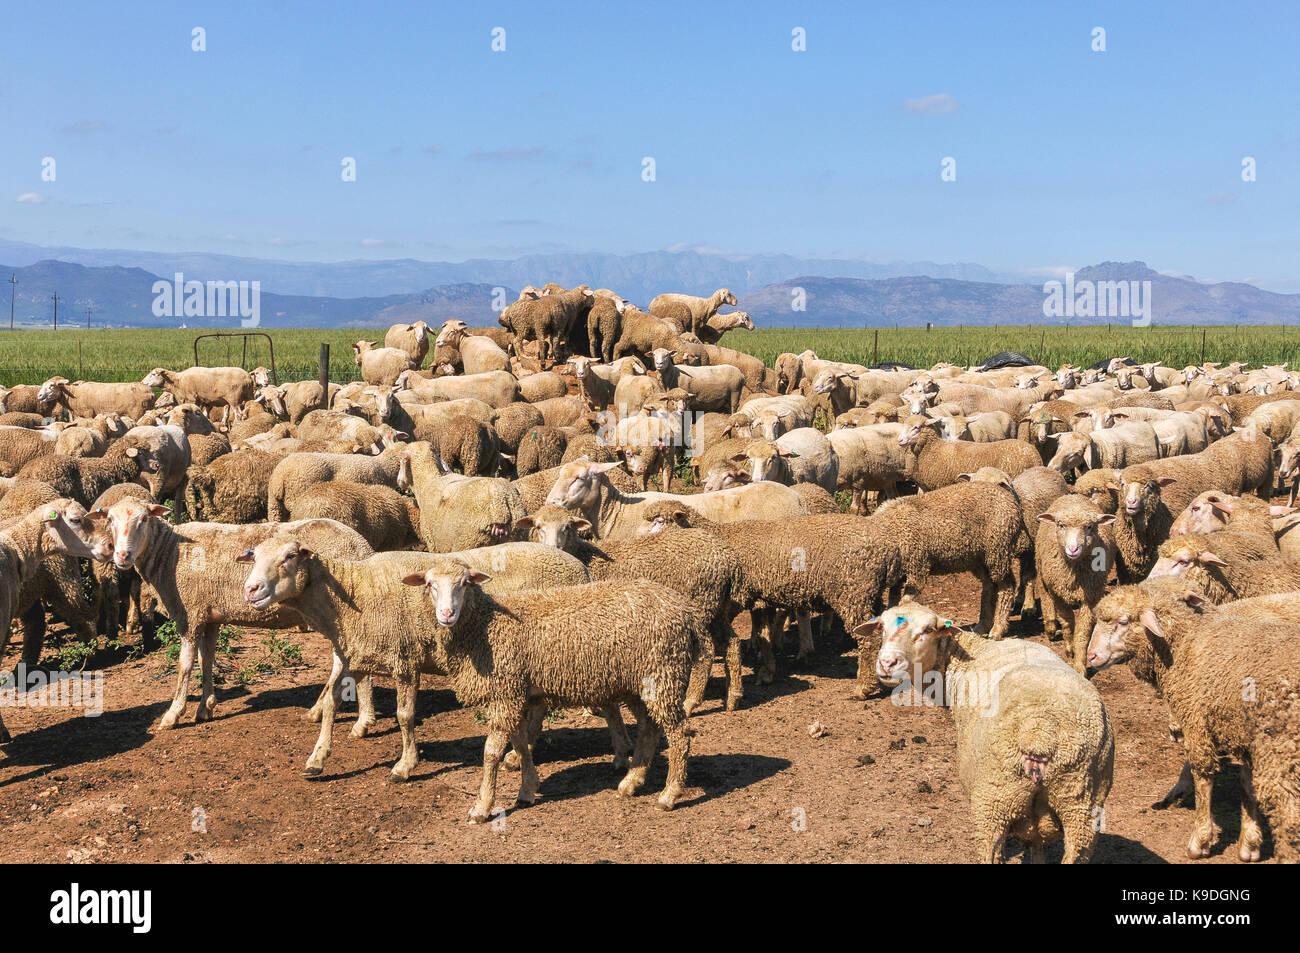 sheep at Riebeek Wes, Swartland, South Africa Stock Photo